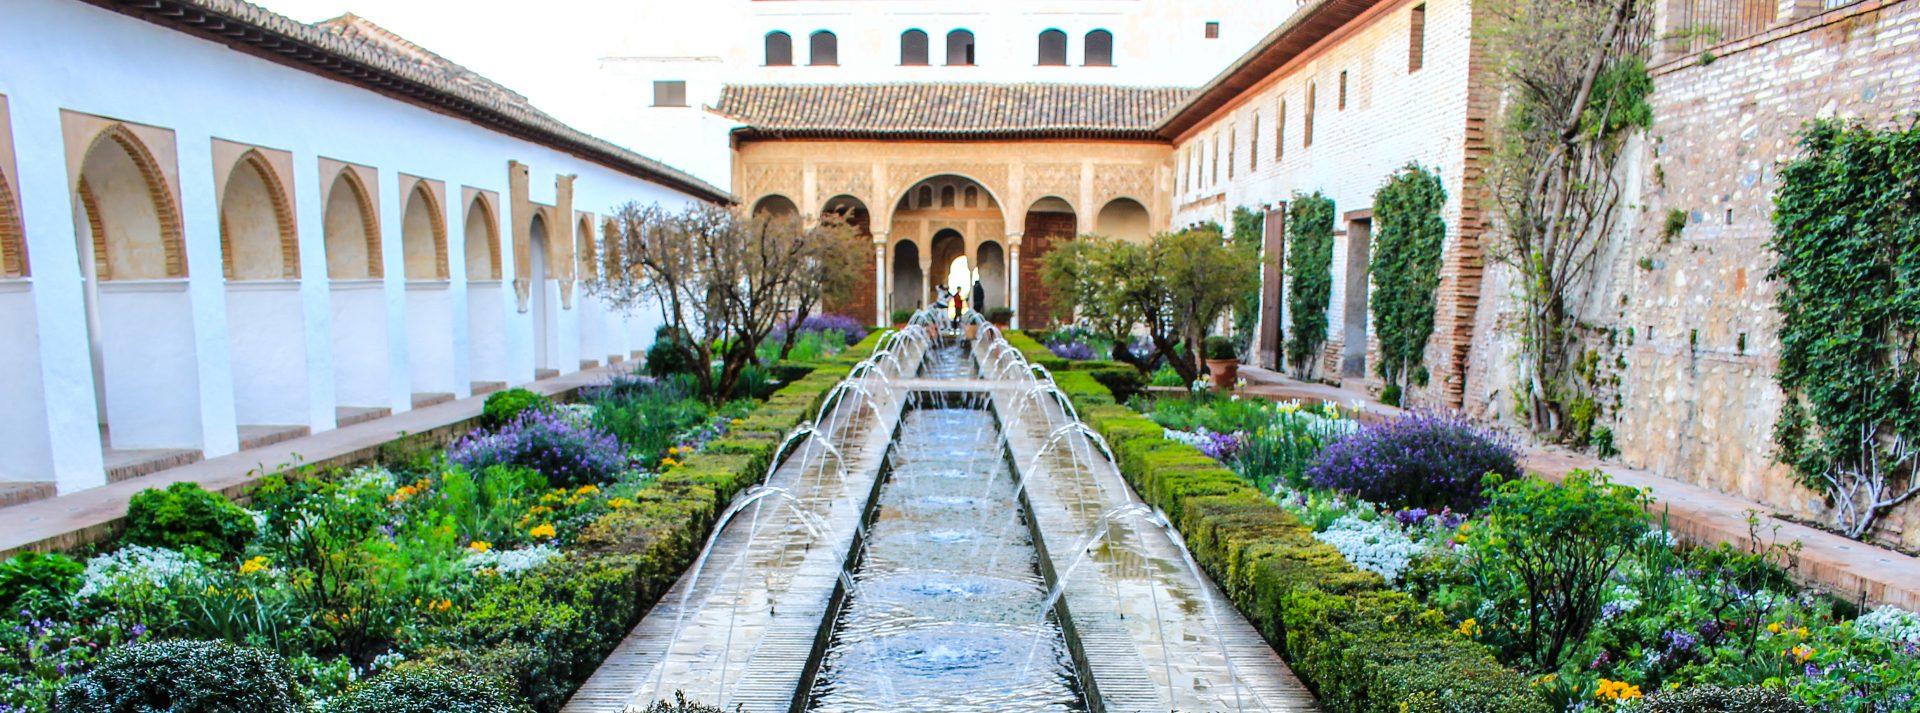 Securing Tickets to Alhambra – Best Way to Visit Alhambra, Granada, Spain